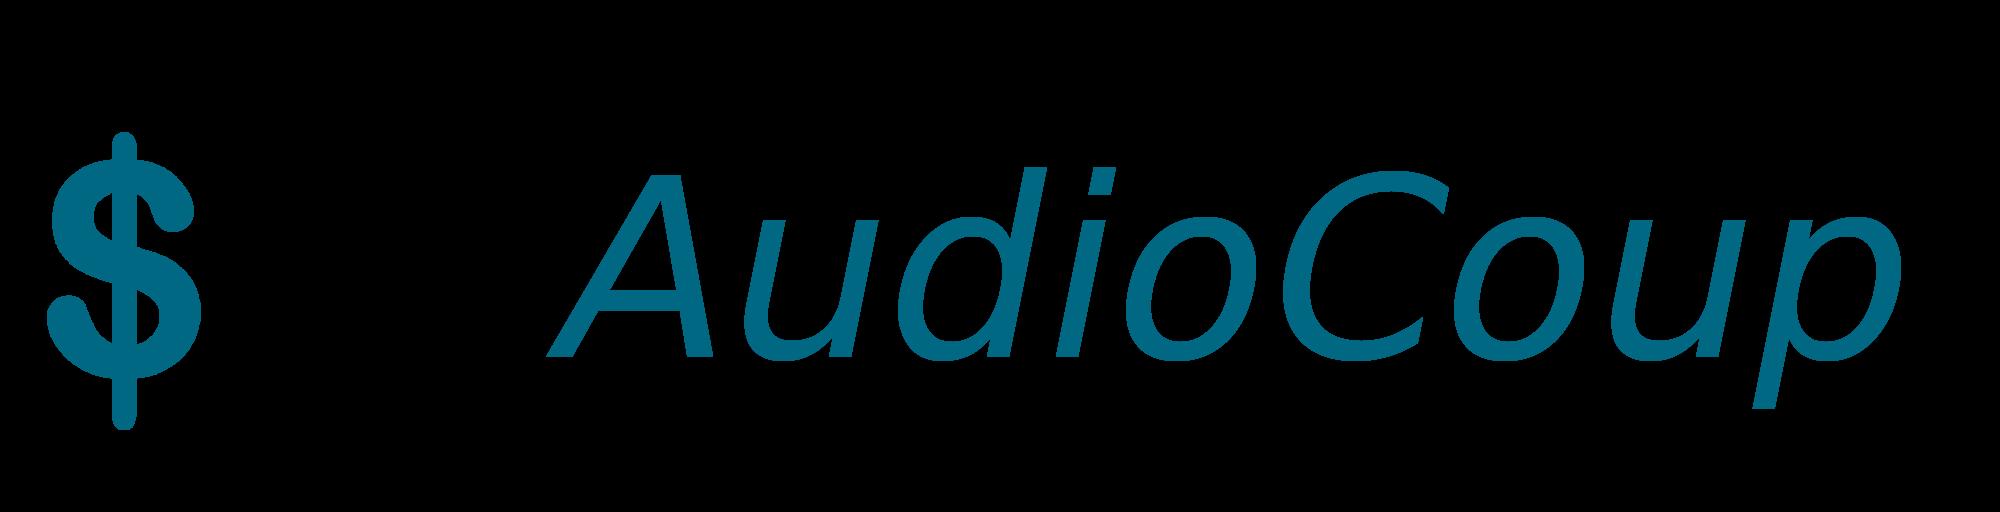 AudioCoup